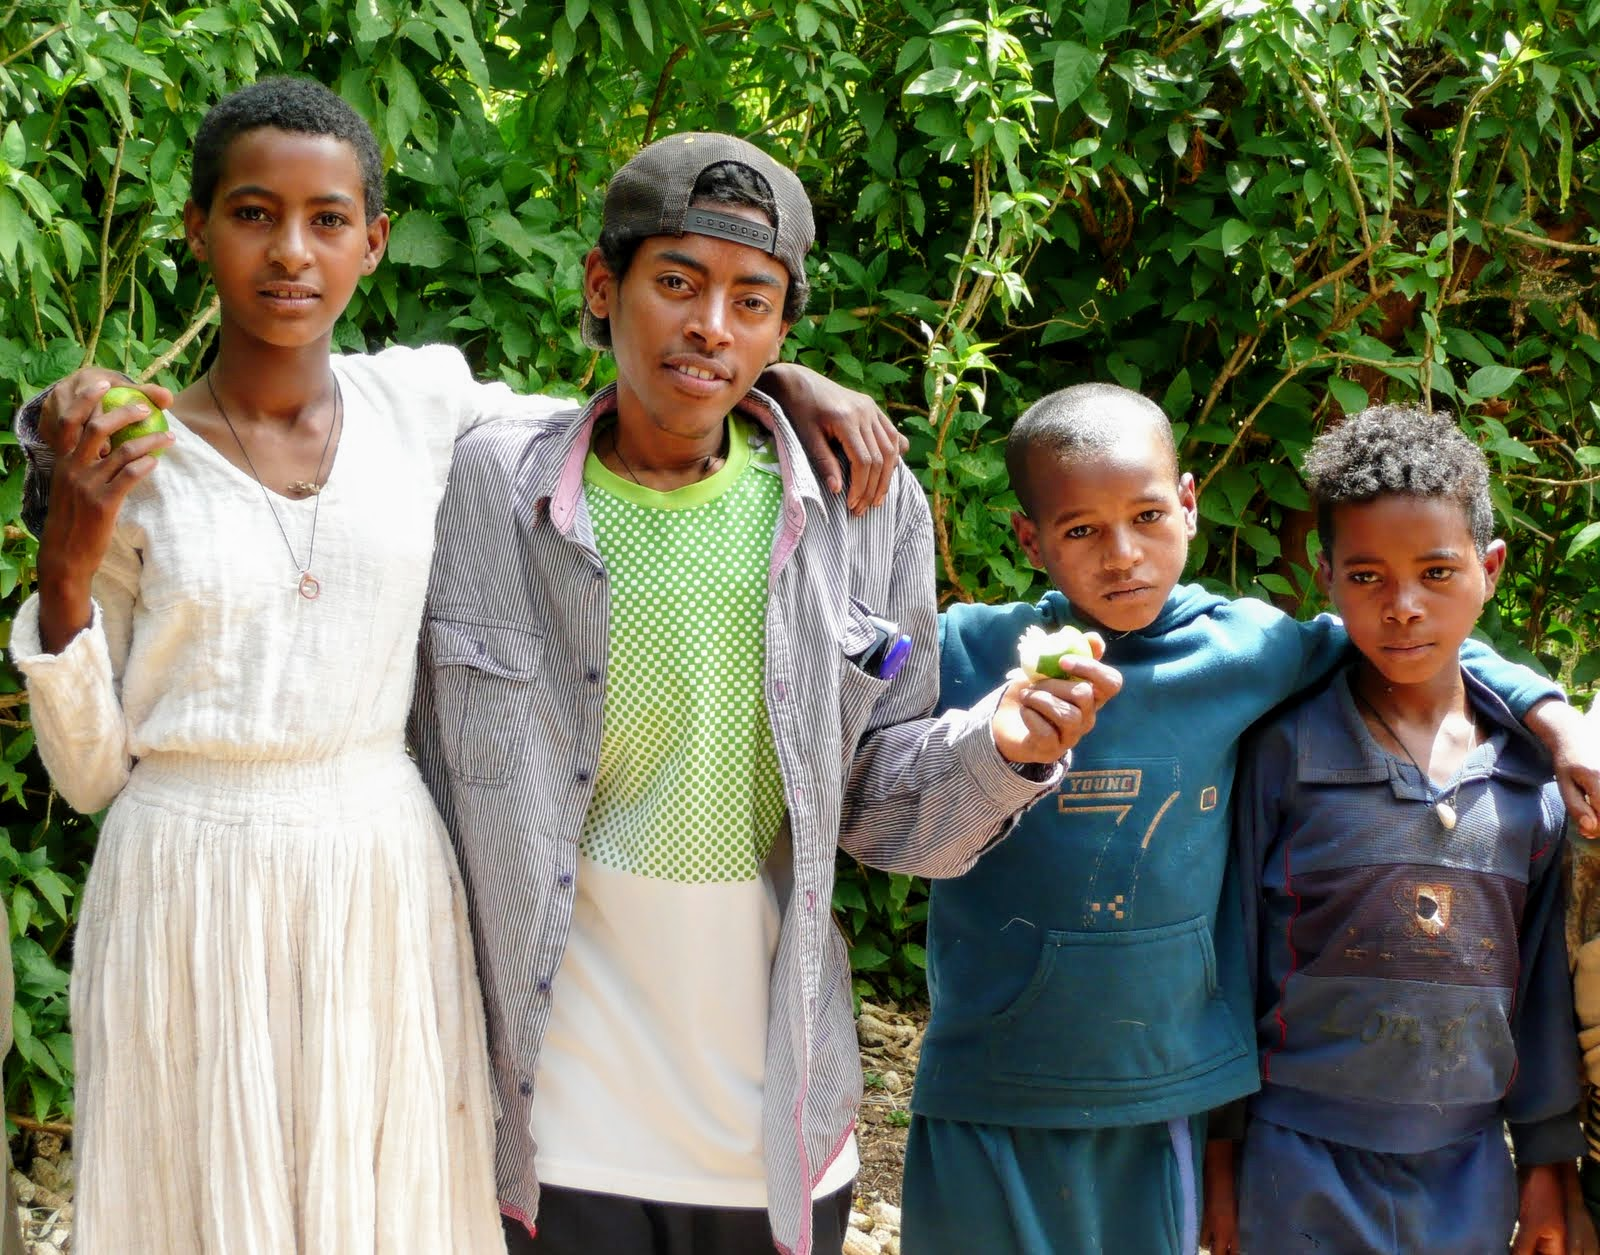 Tesfaye, Fanteye and two brothers.